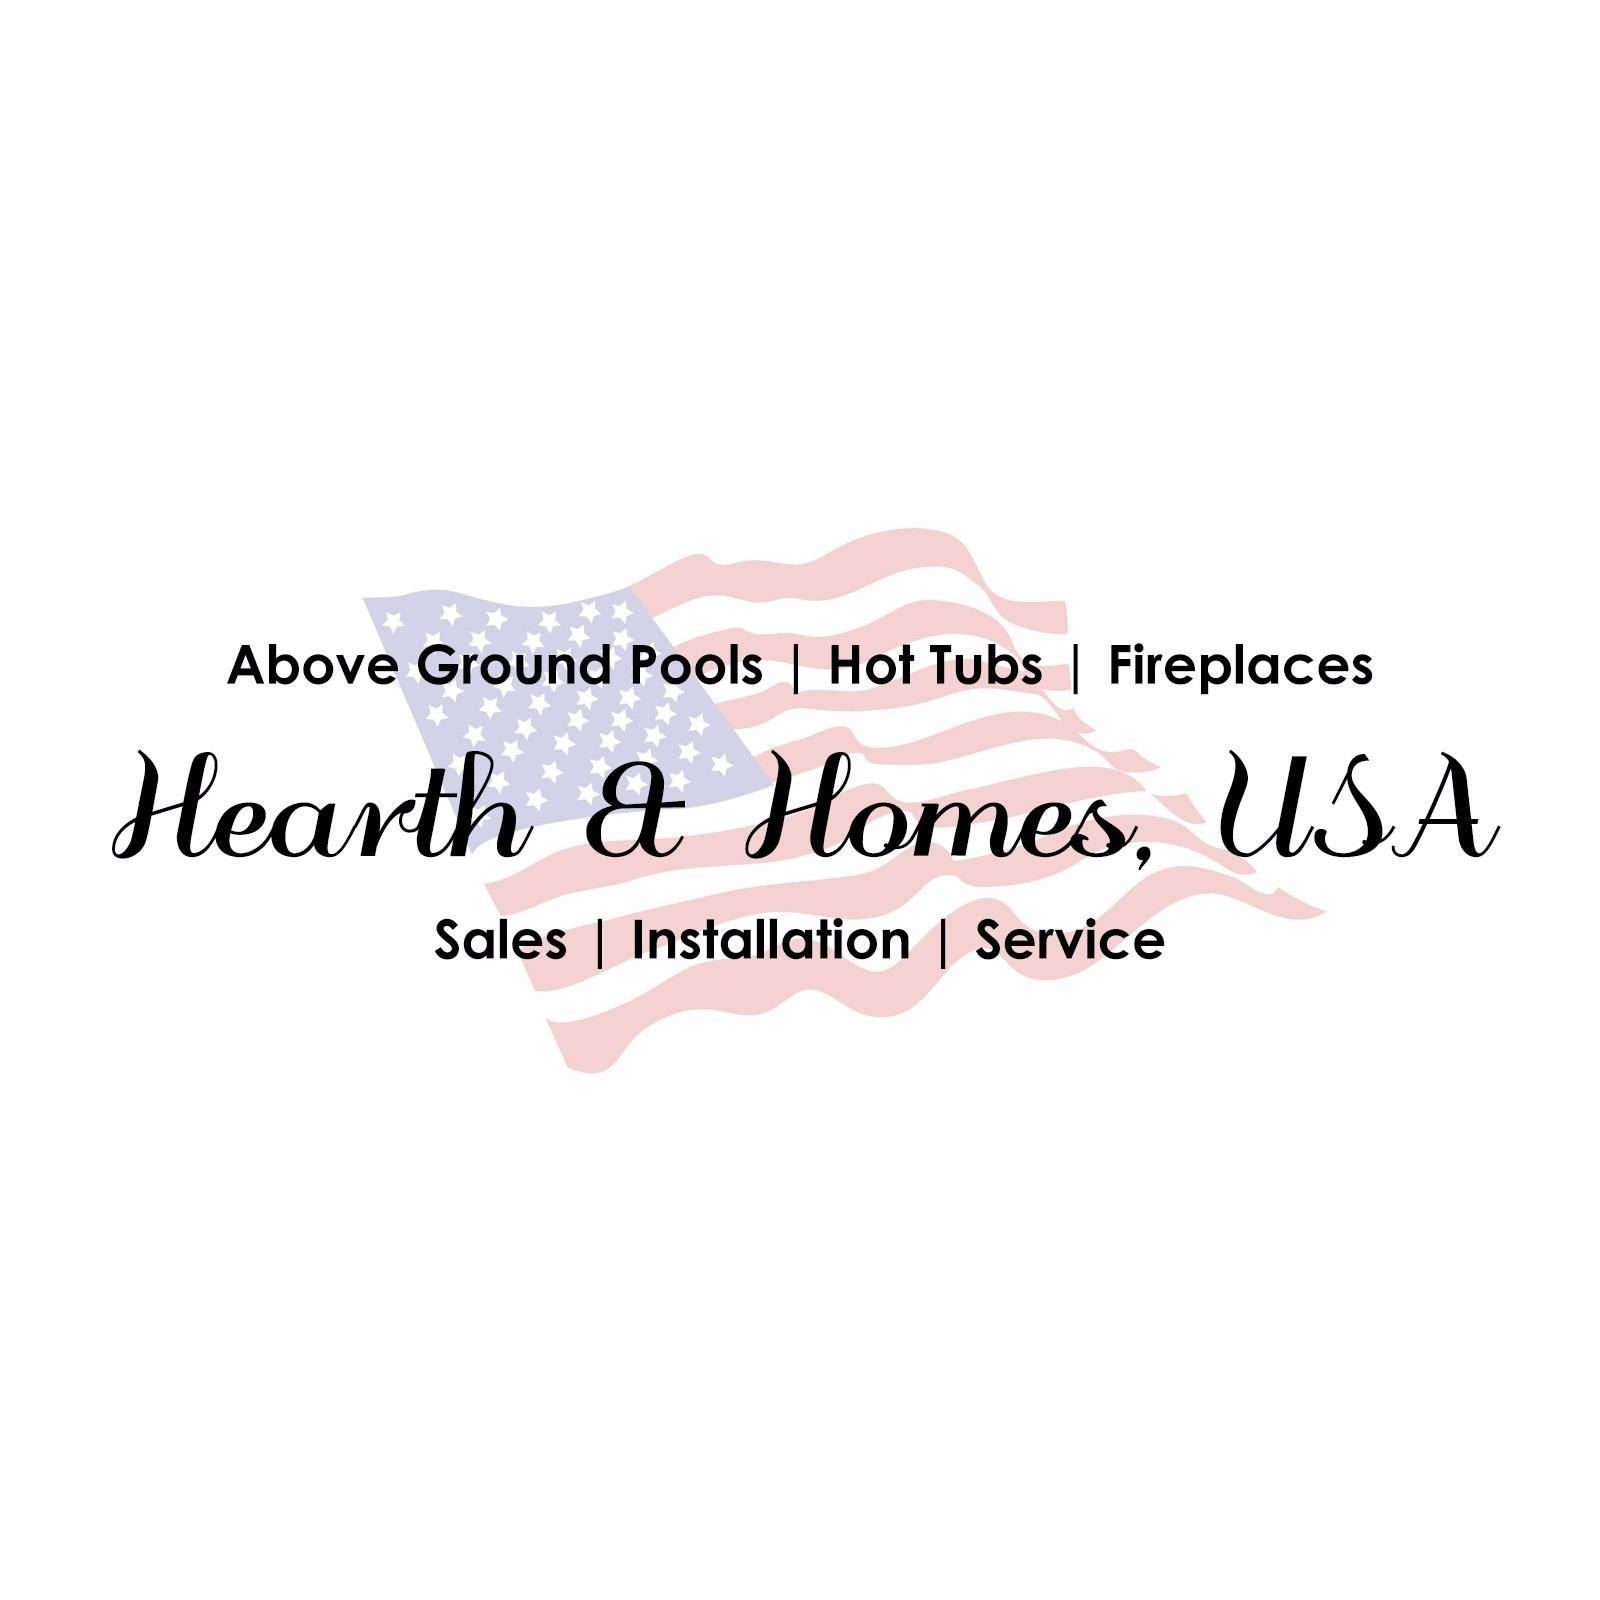 Hearth & Homes, USA